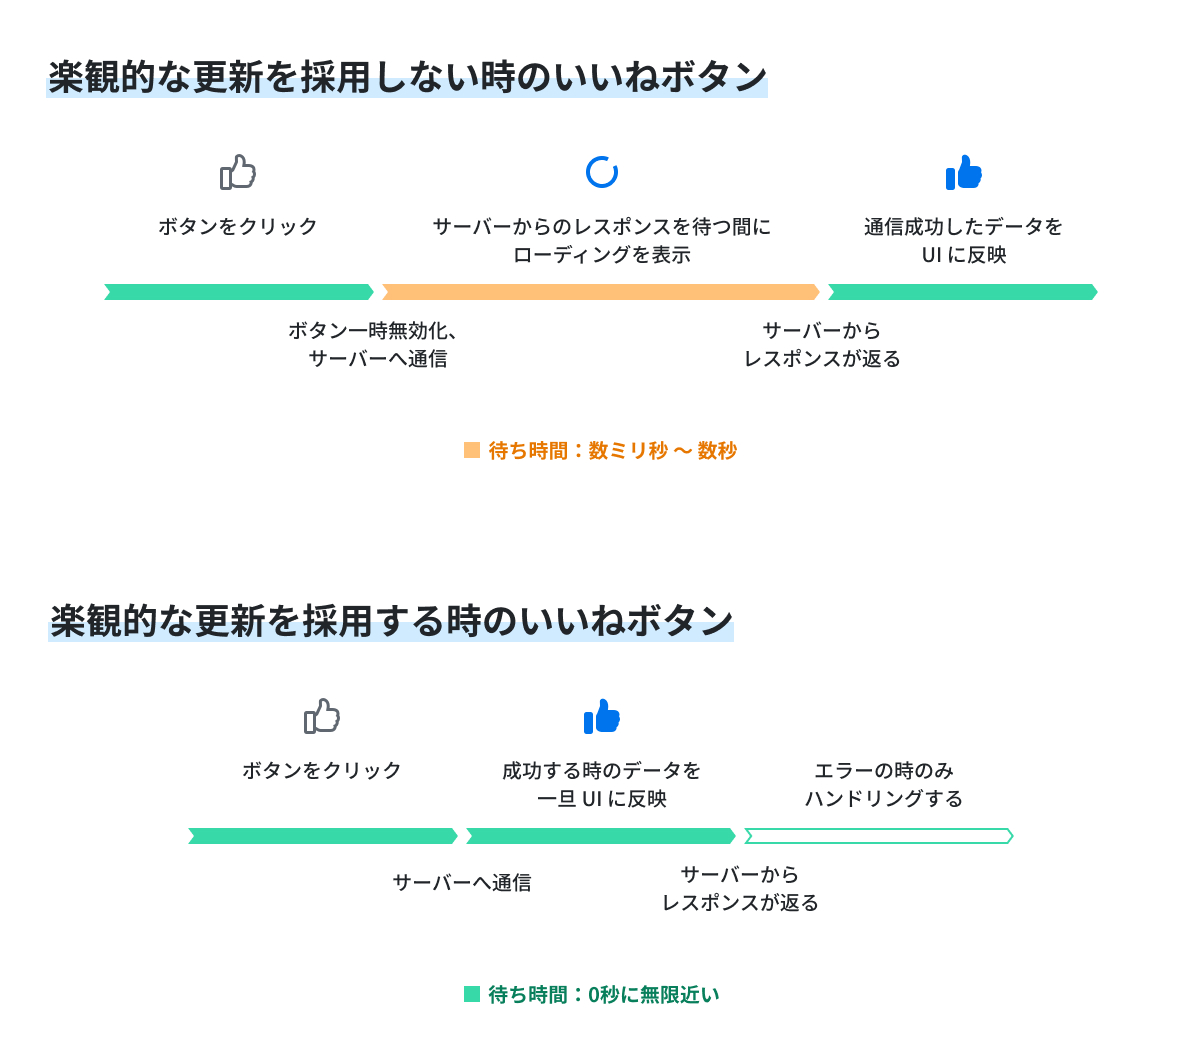 f:id:kaminashi-developer:20210201115130j:plain